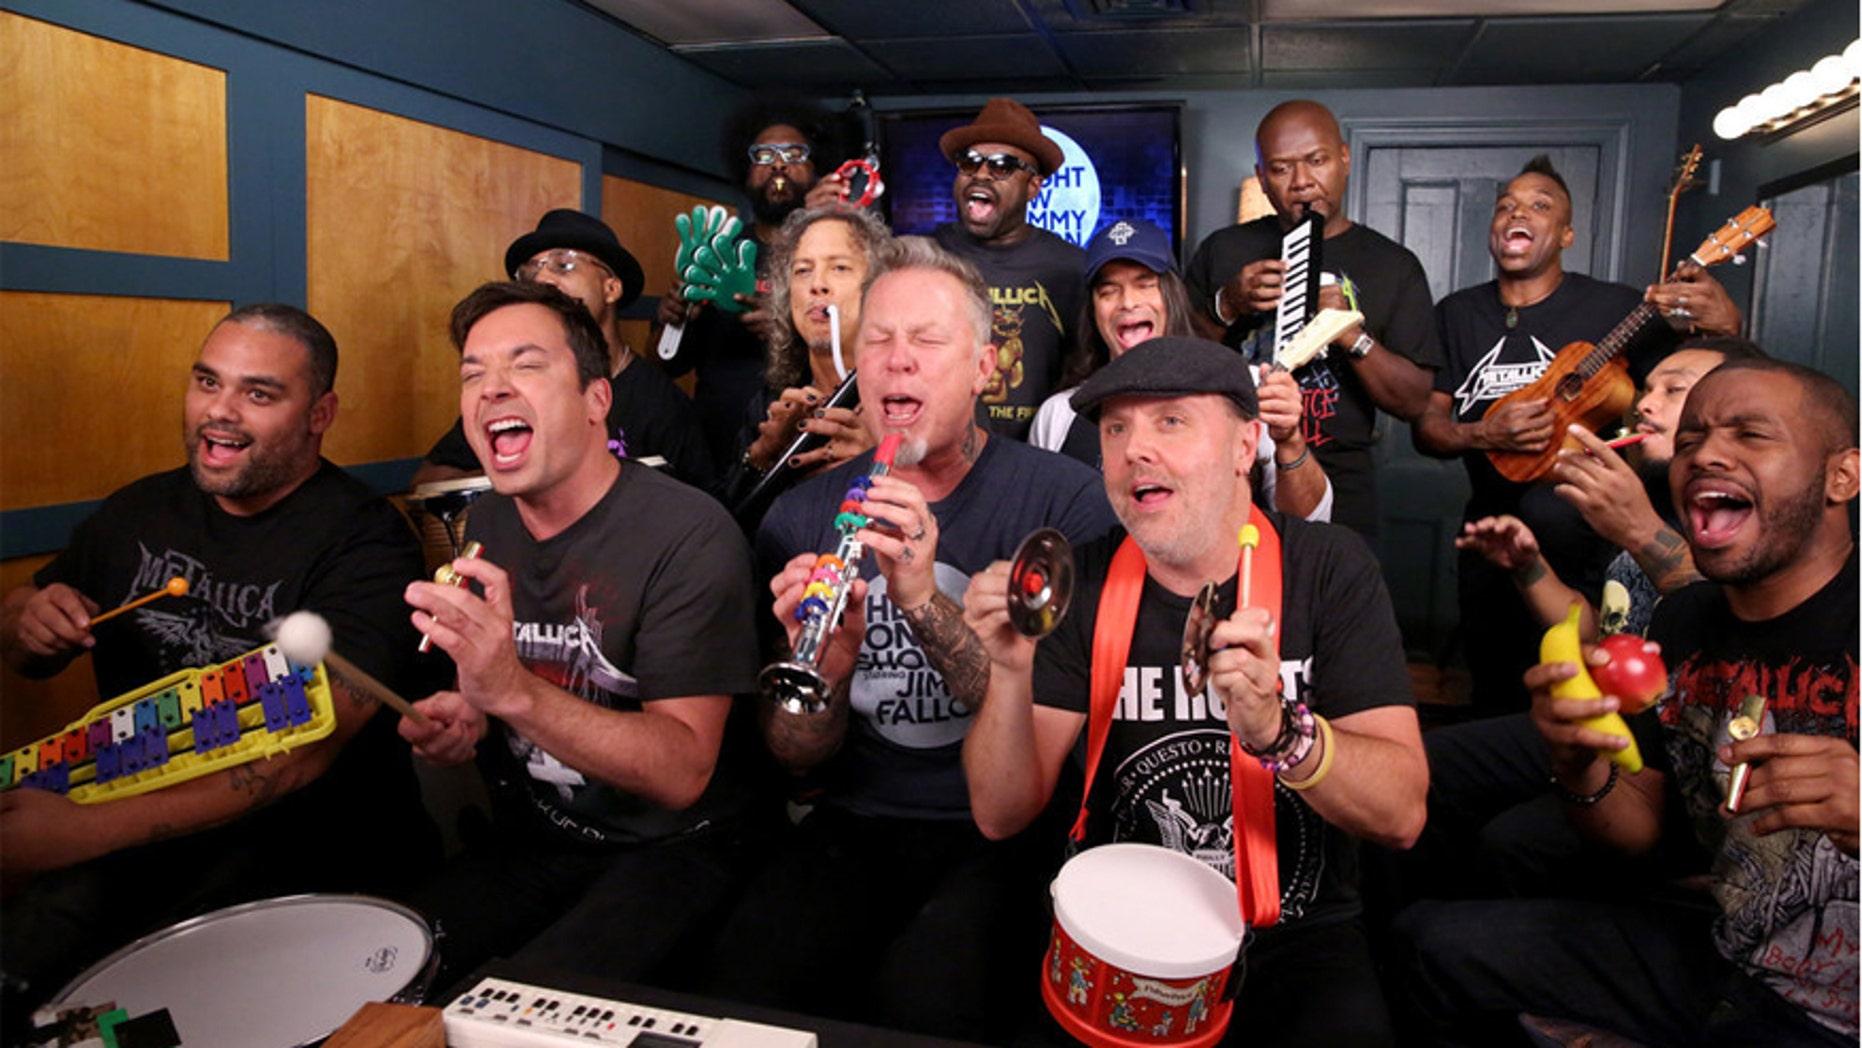 "Pictured: (l-r) James ""Kamal"" Gray, host Jimmy Fallon, Frank ""Knuckles"" Walker, Ahmir ""Questlove"" Thompson, Kirk Hammett, James Hetfield, Tariq ""Black Thought"" Trotter, Robert Trujillo, Lars Ulrich, James Poyser, Kirk ""Captain Kirk"" Douglas, Mark Kelley, and Damon ""Tuba Gooding Jr."" Bryson sing during the ""Metallica Music Room"" sketch on November 16, 2016."